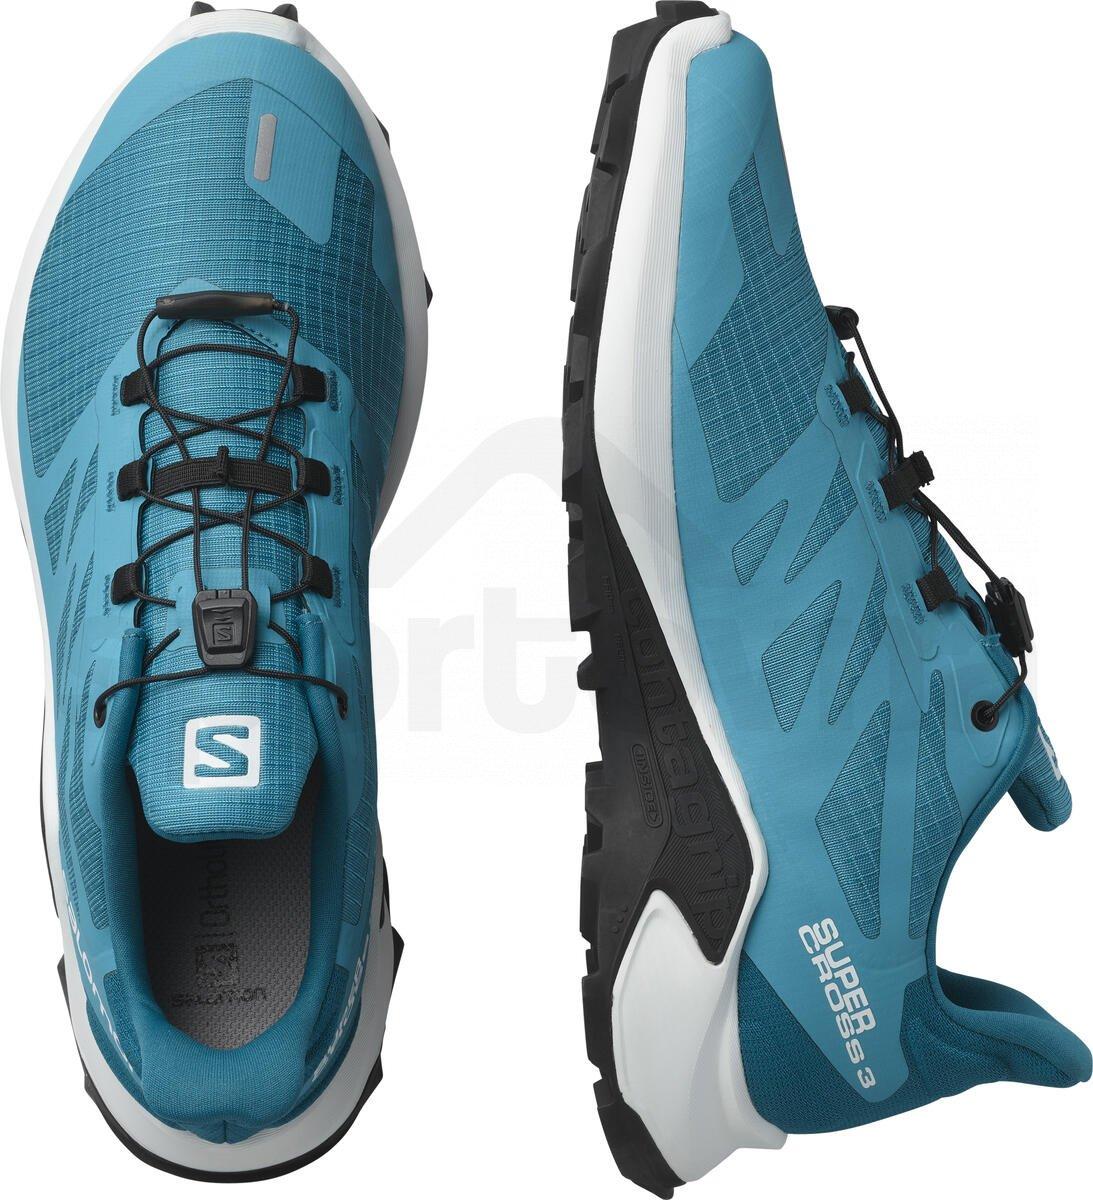 Obuv Salomon SUPERCROSS 3 W - modrá/bílá